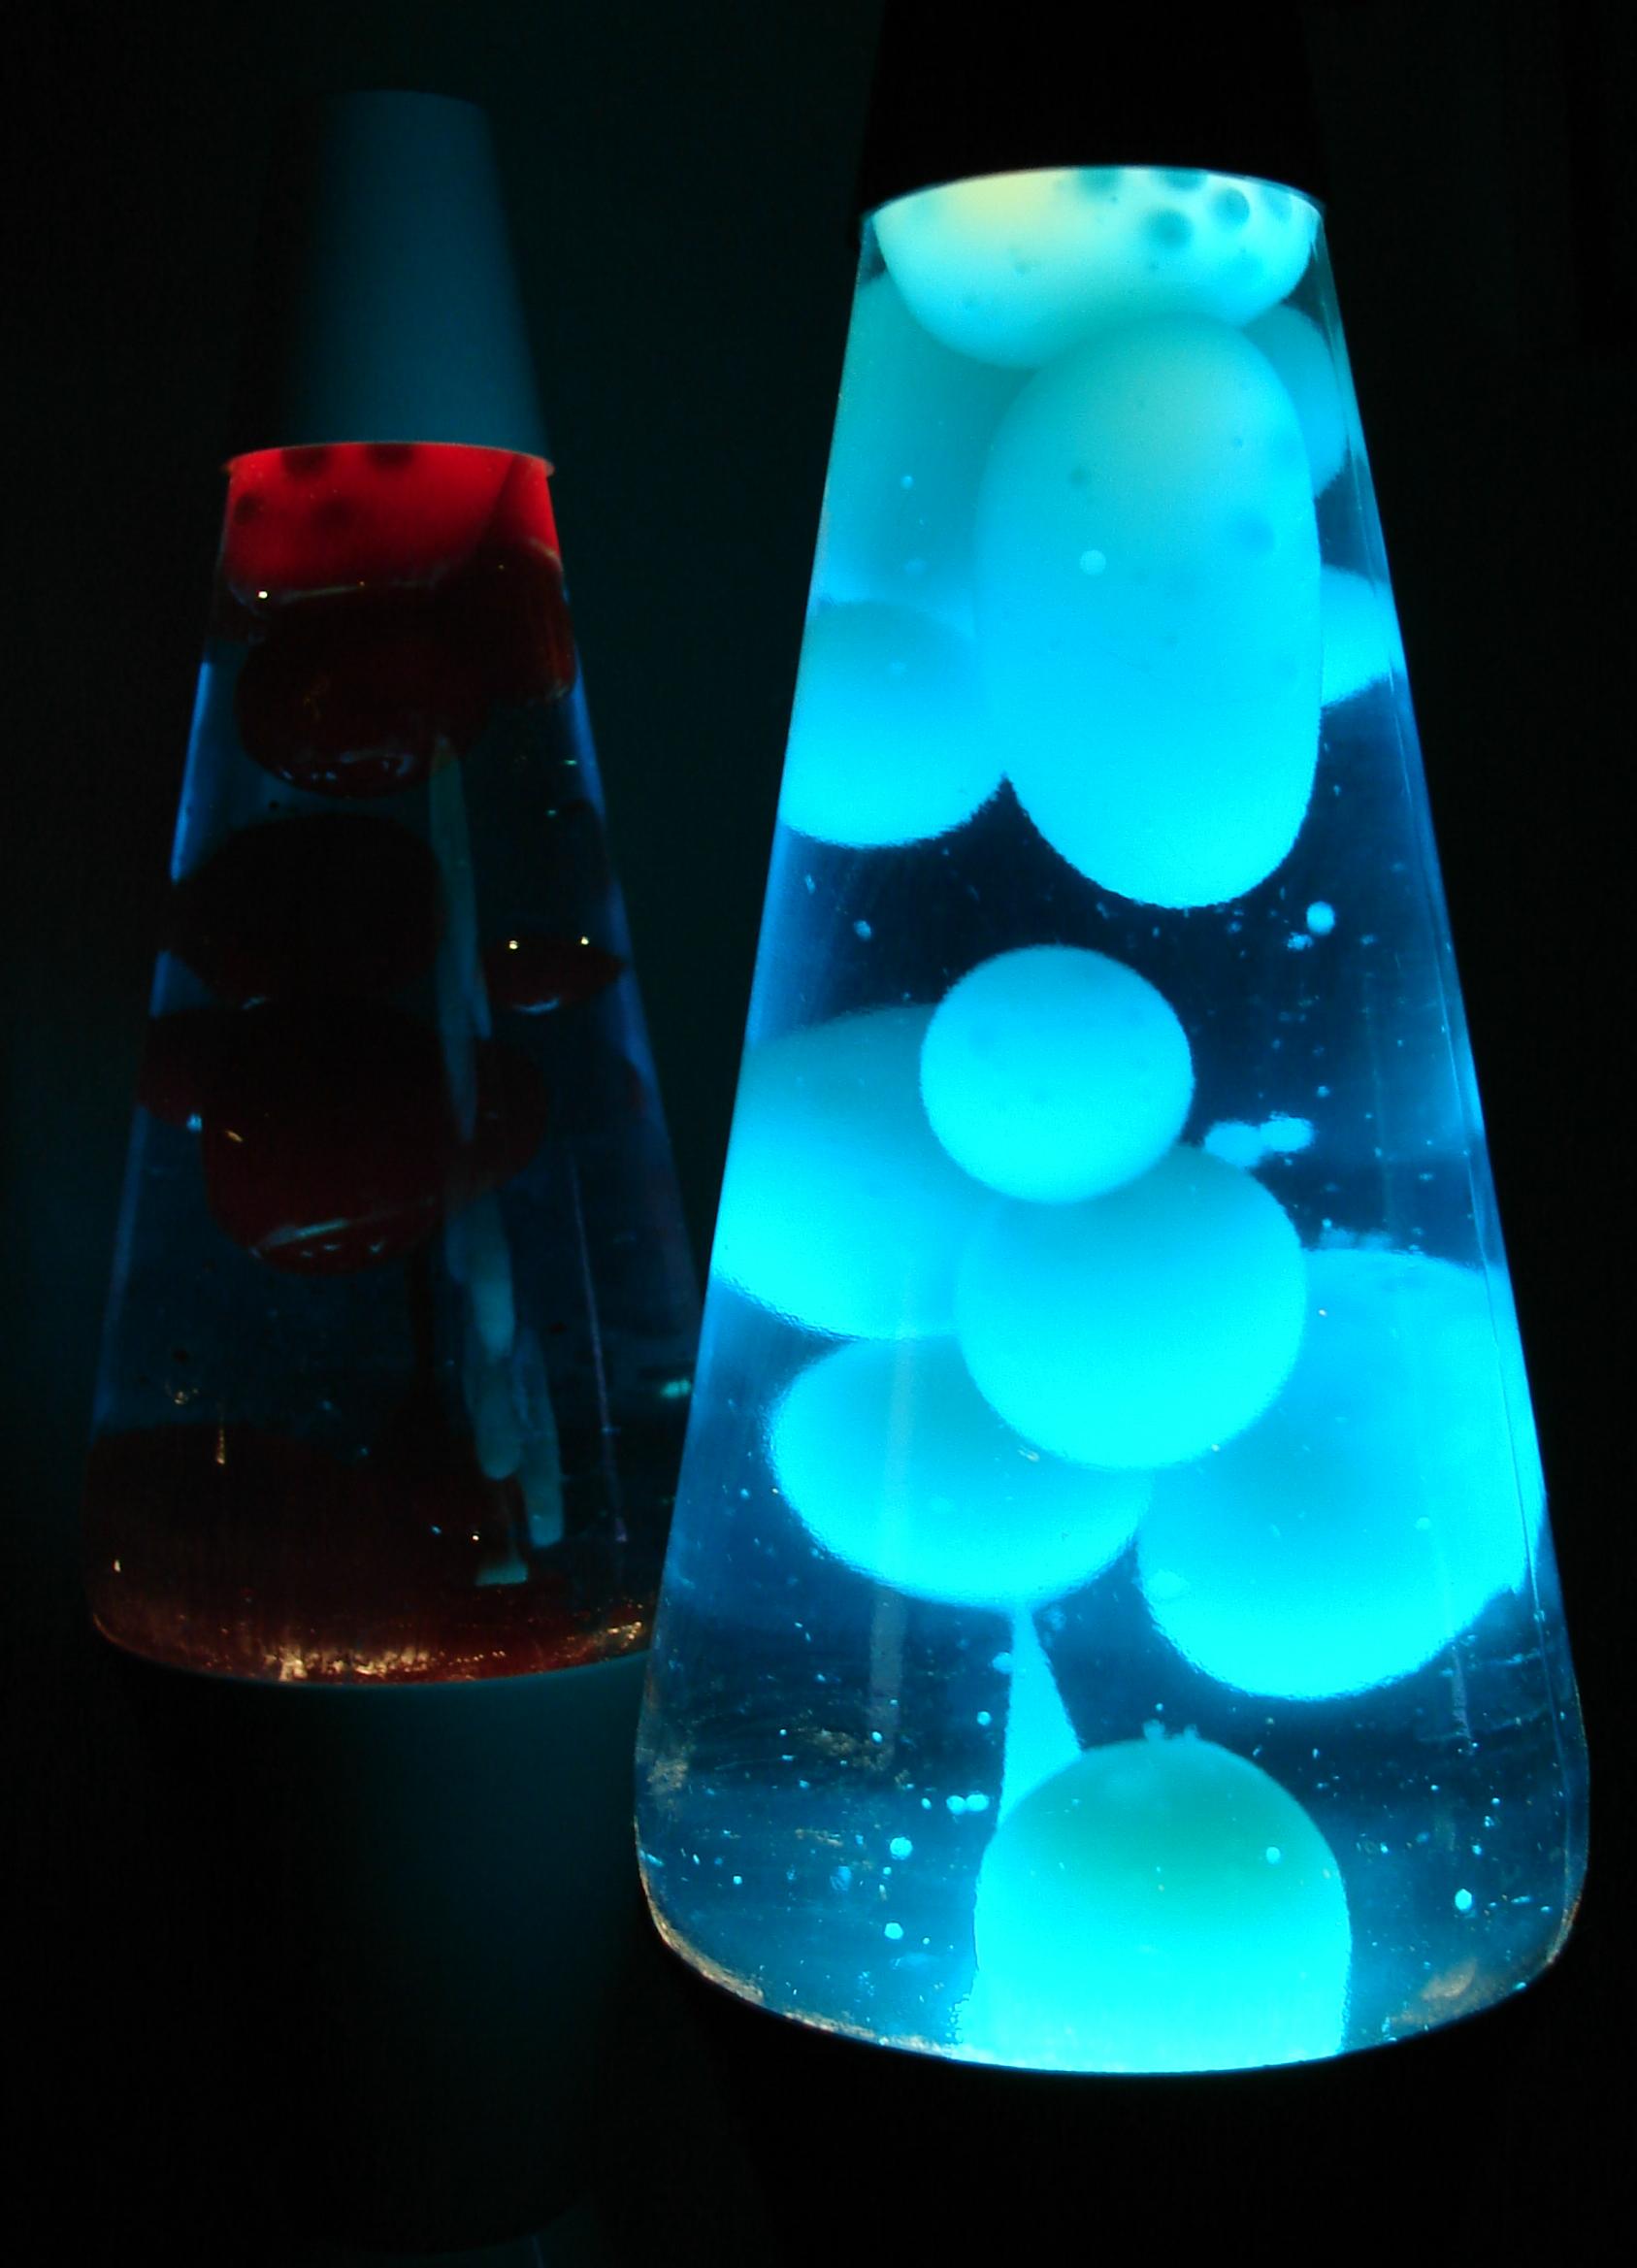 wax lamp photo - 2